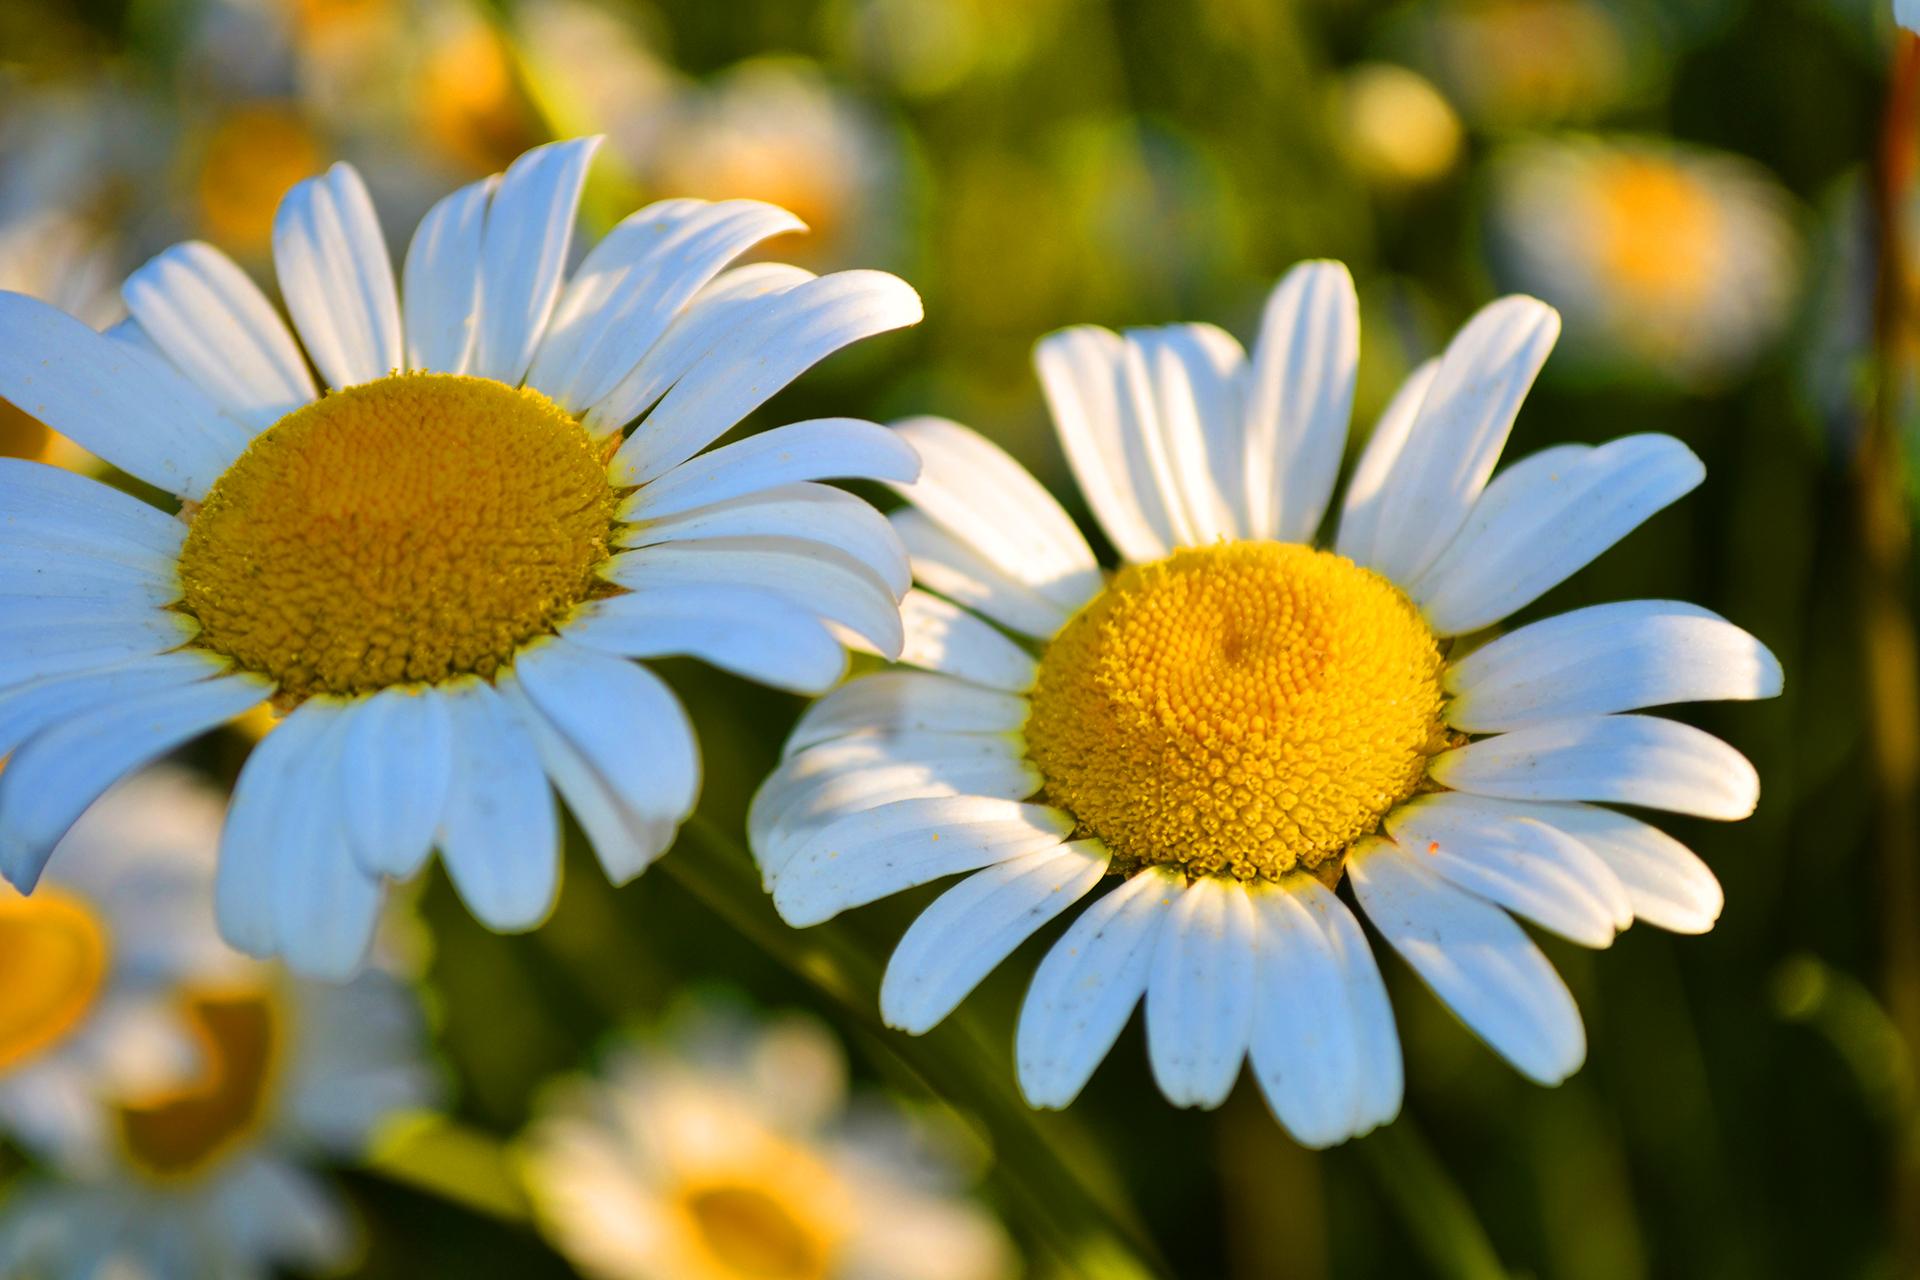 Cute Small Animals Wallpapers Daisies Flower Hd Desktop Wallpapers 4k Hd